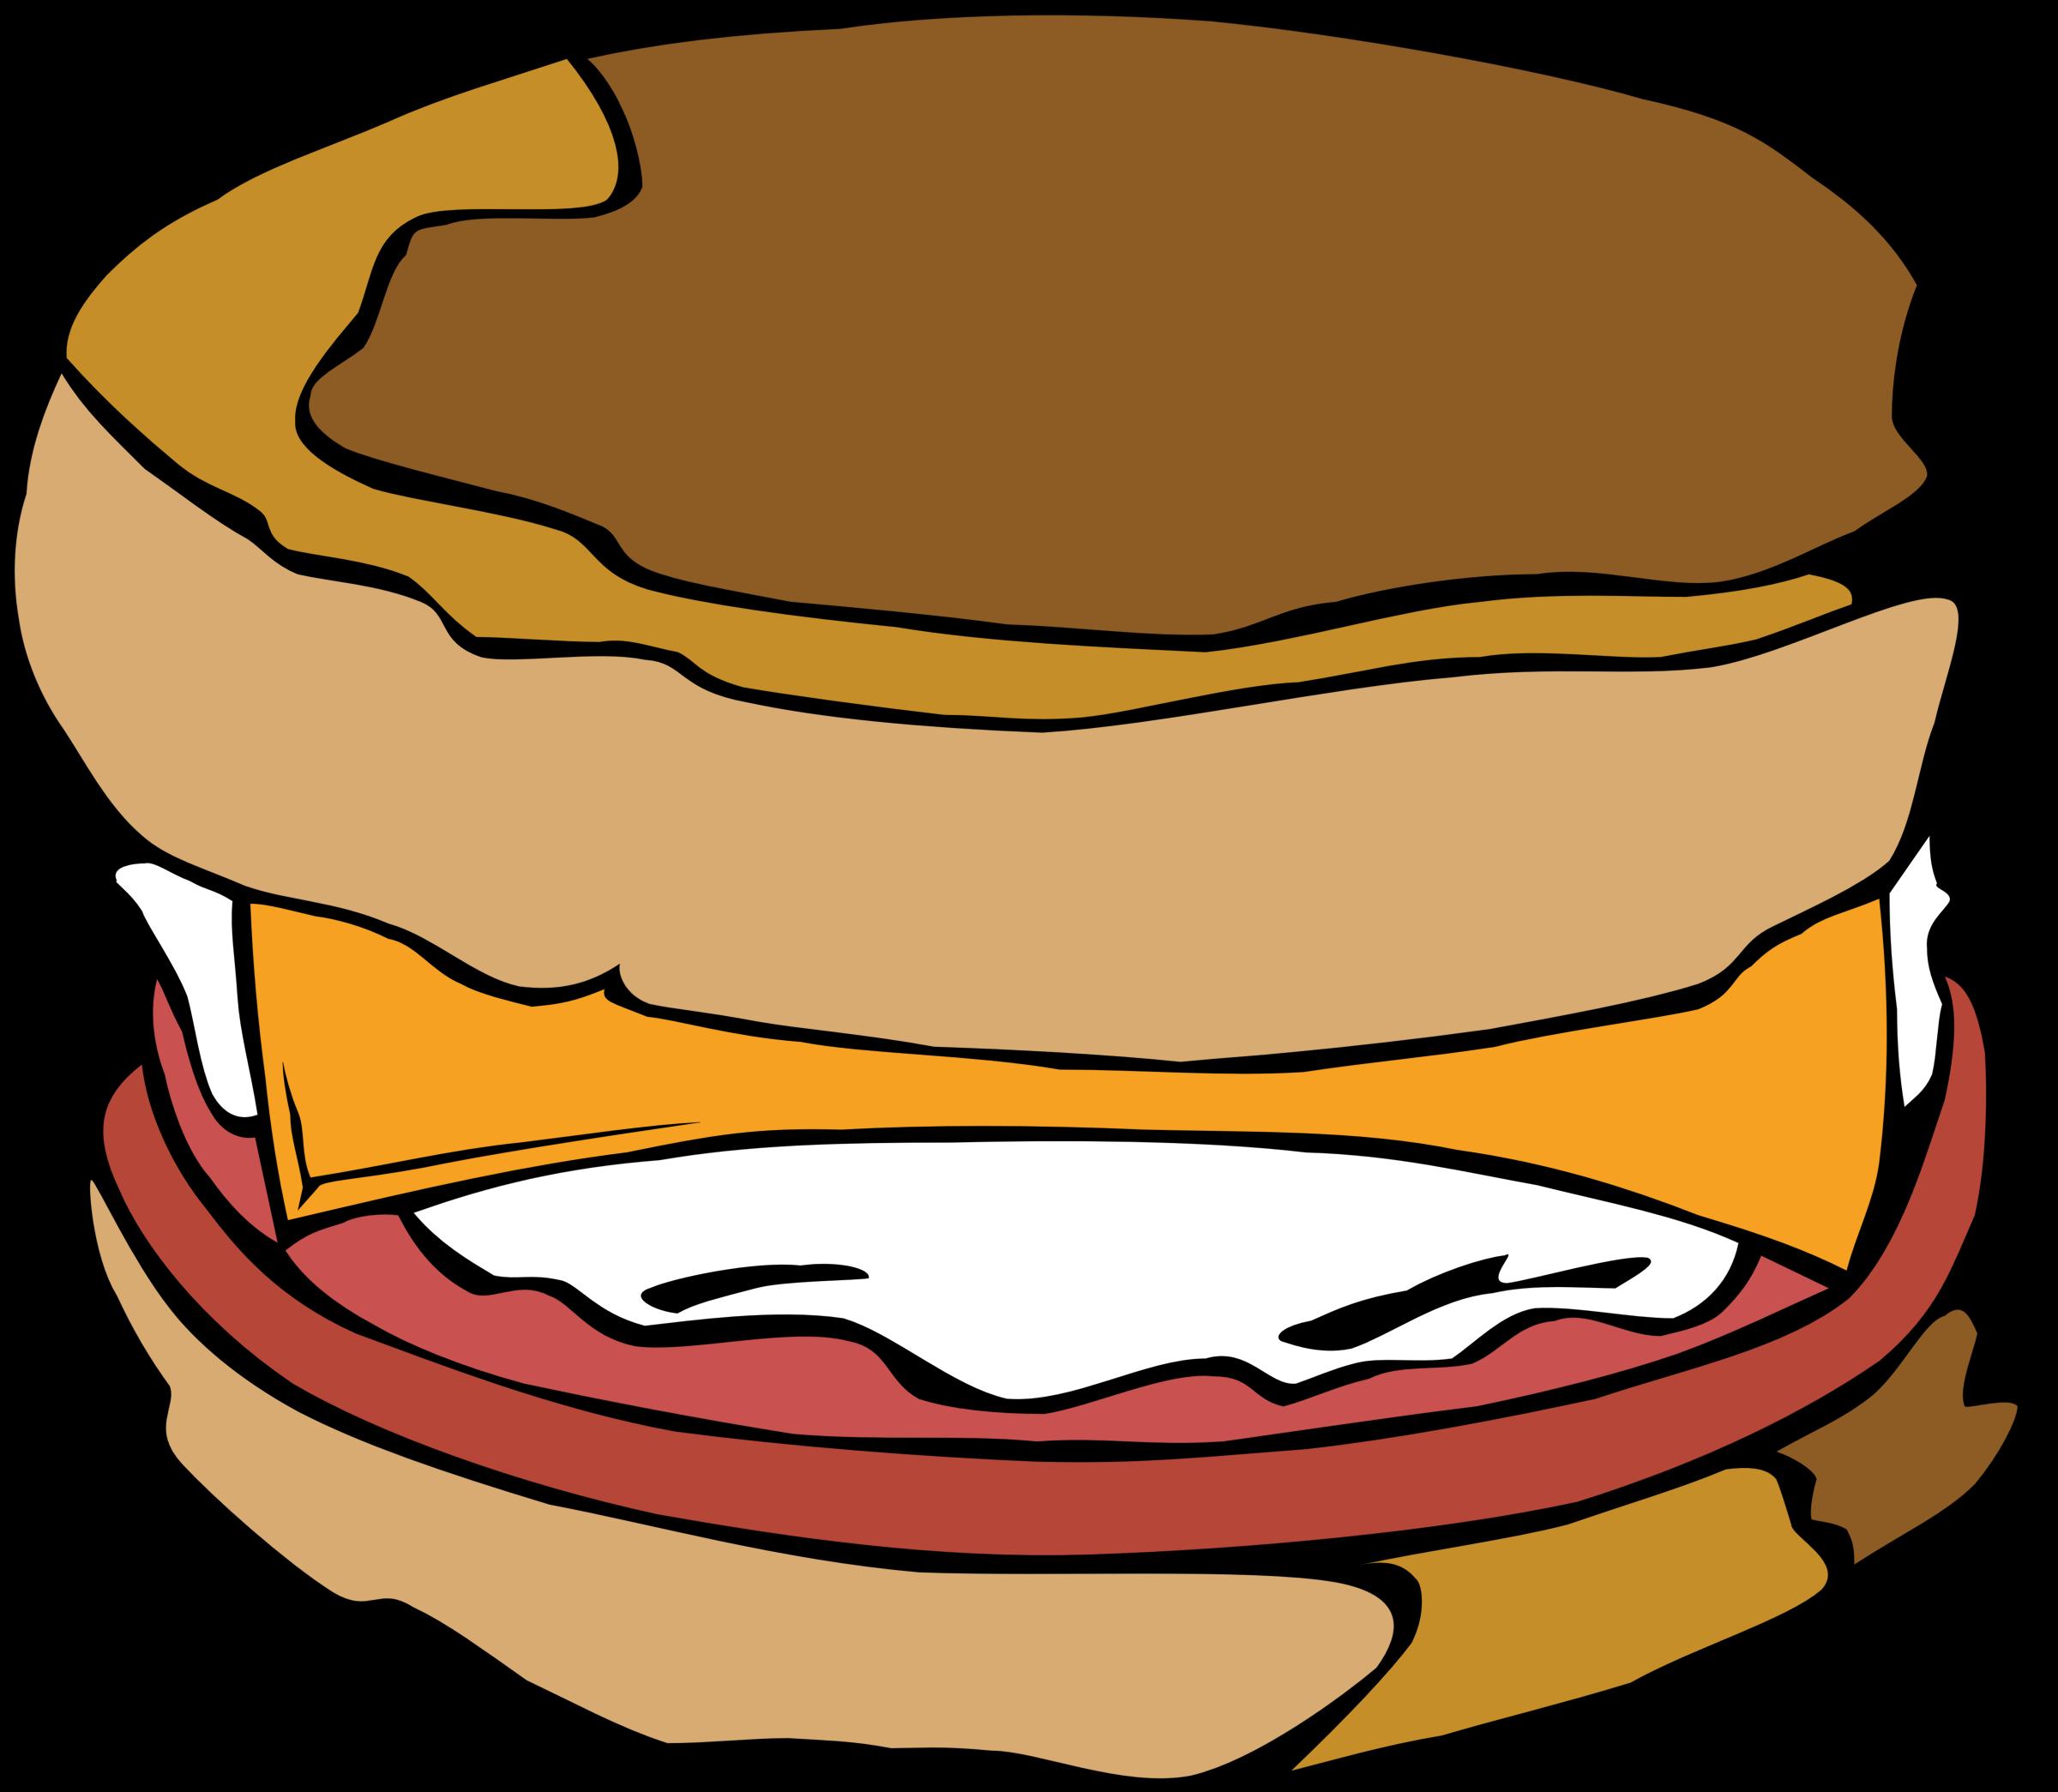 Egg food